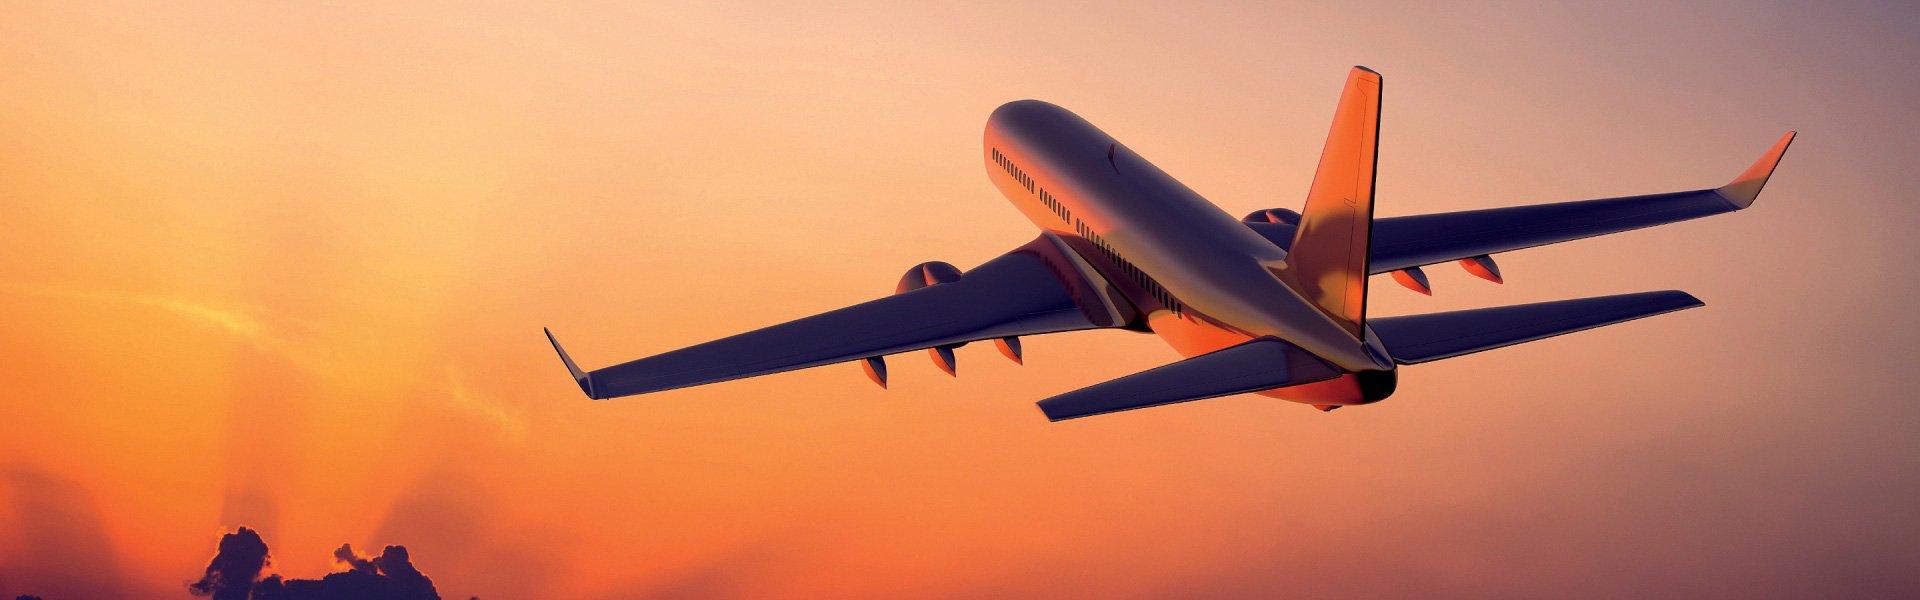 online cheap flight tickets for sale